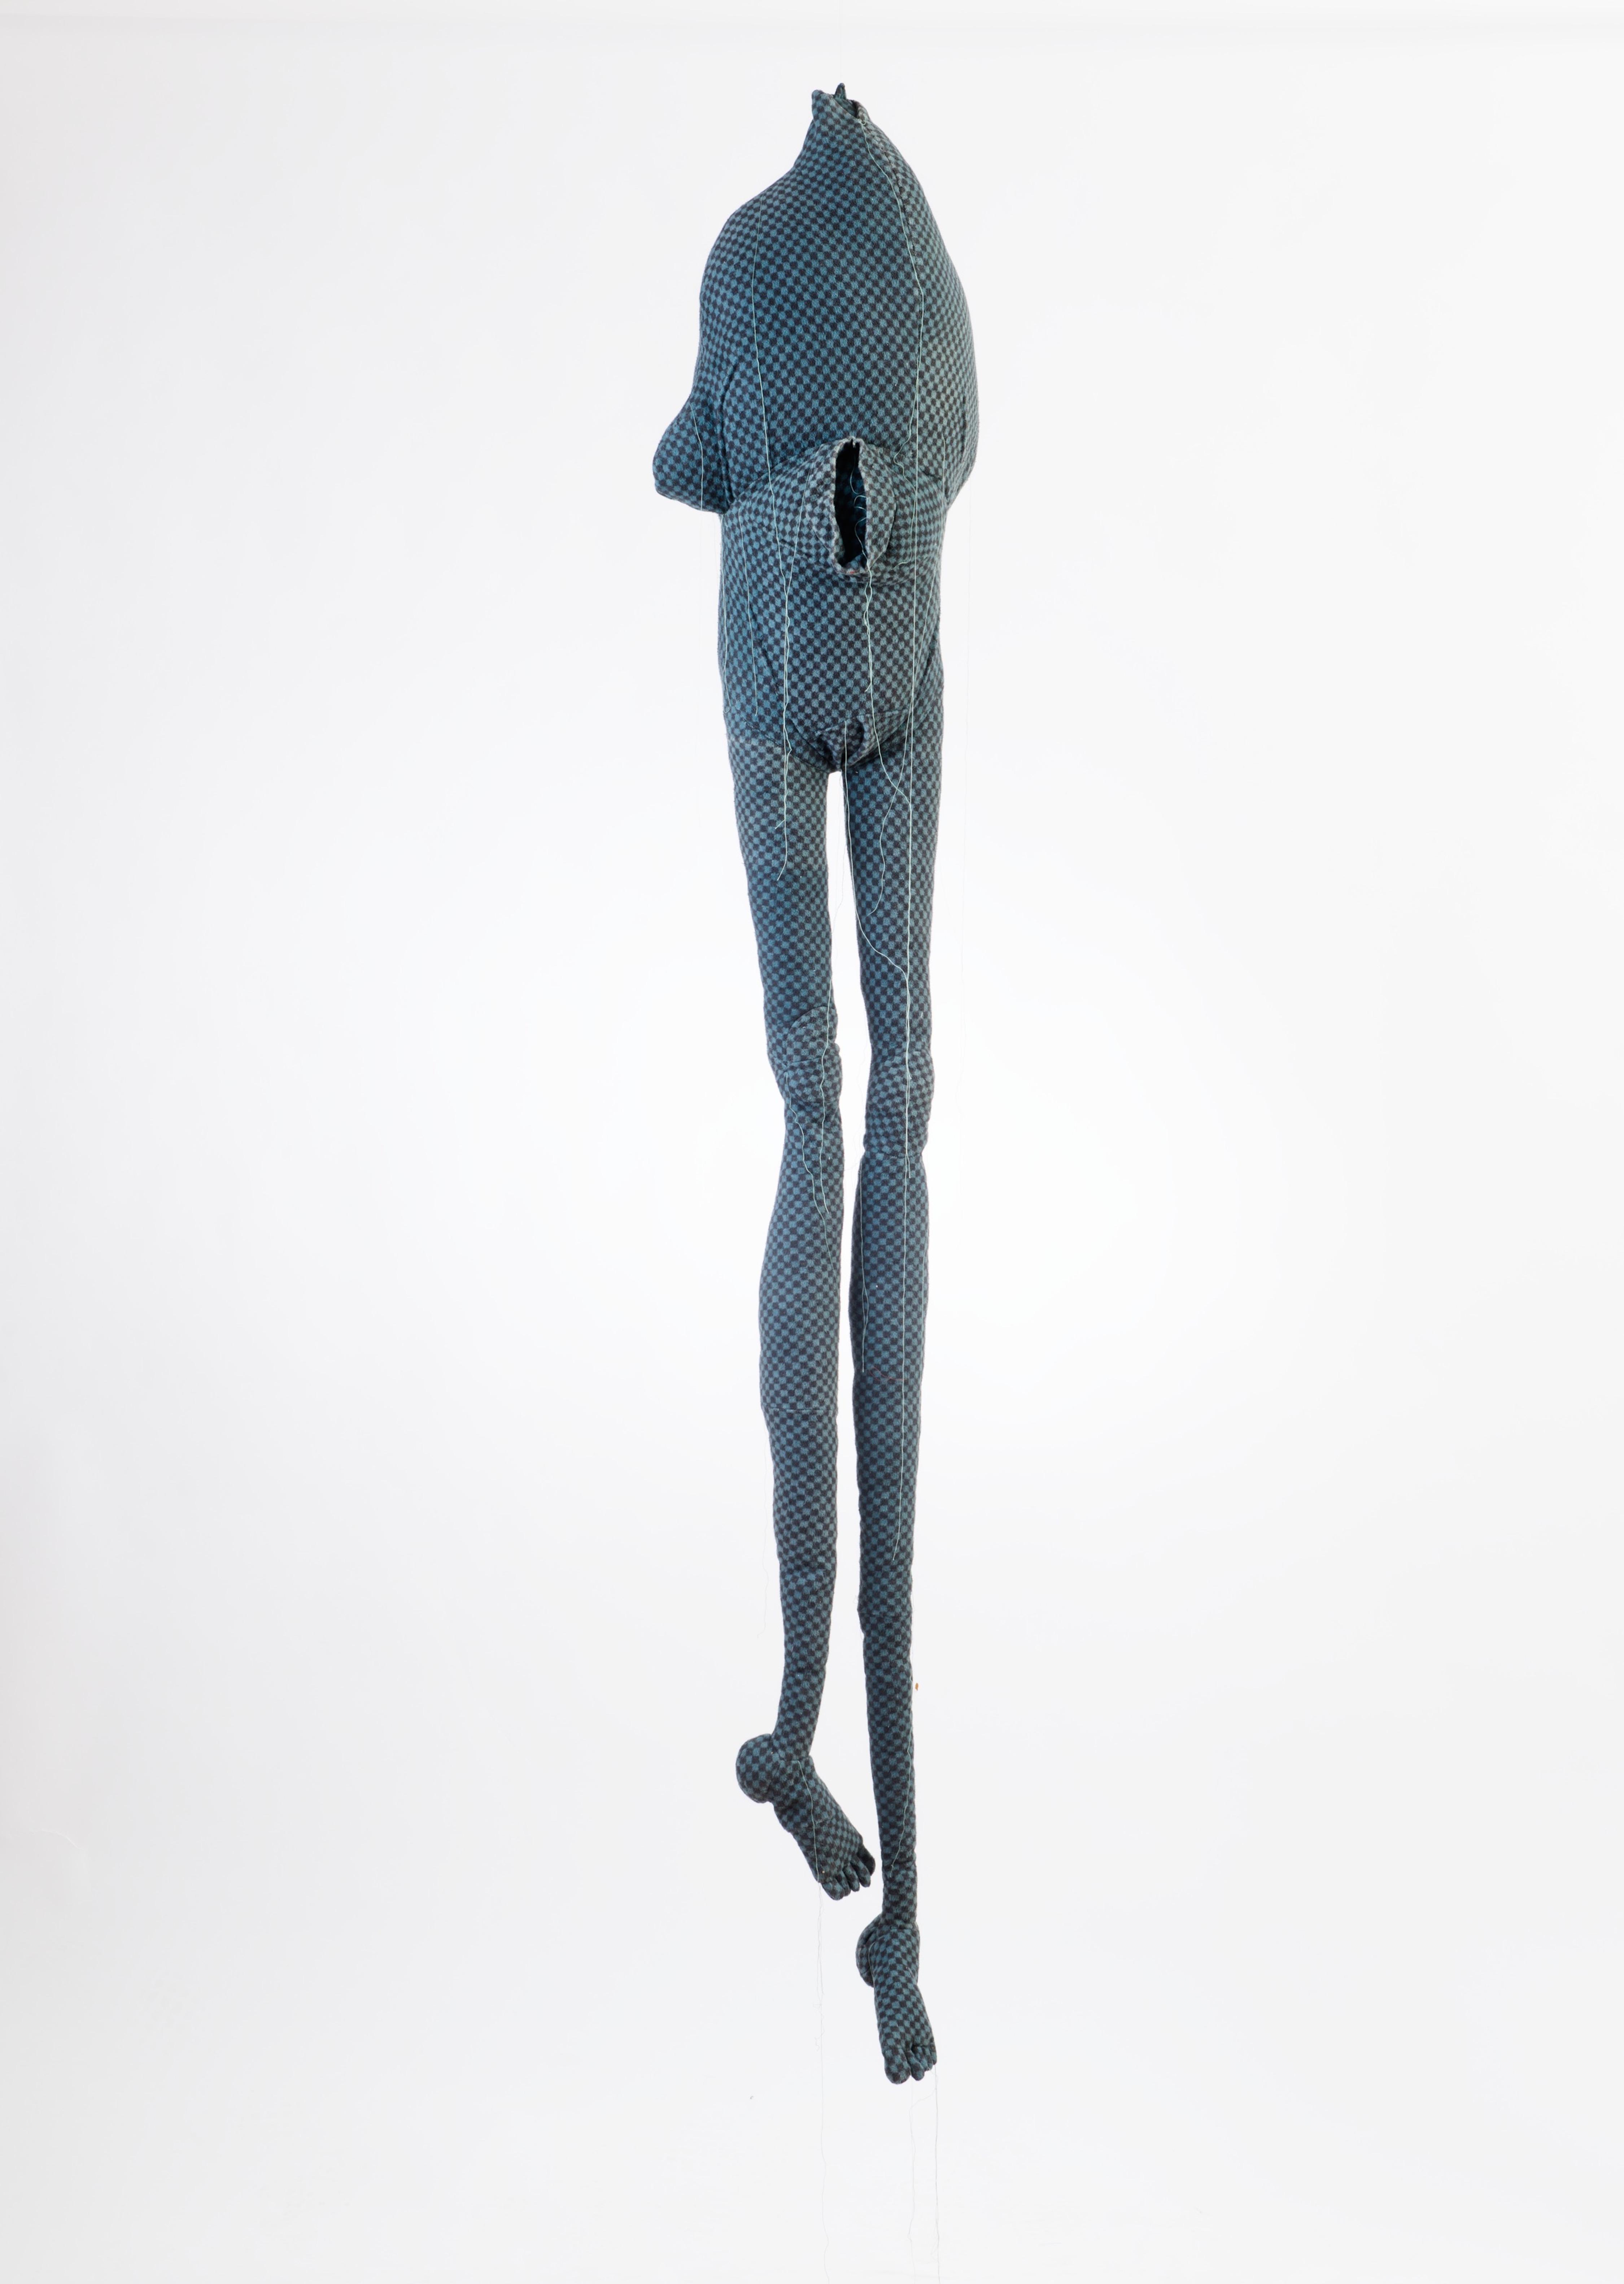 Andrea Vilhena | Abstract#1401b | insider&outsiderart_03 | 2015 | Galerie3